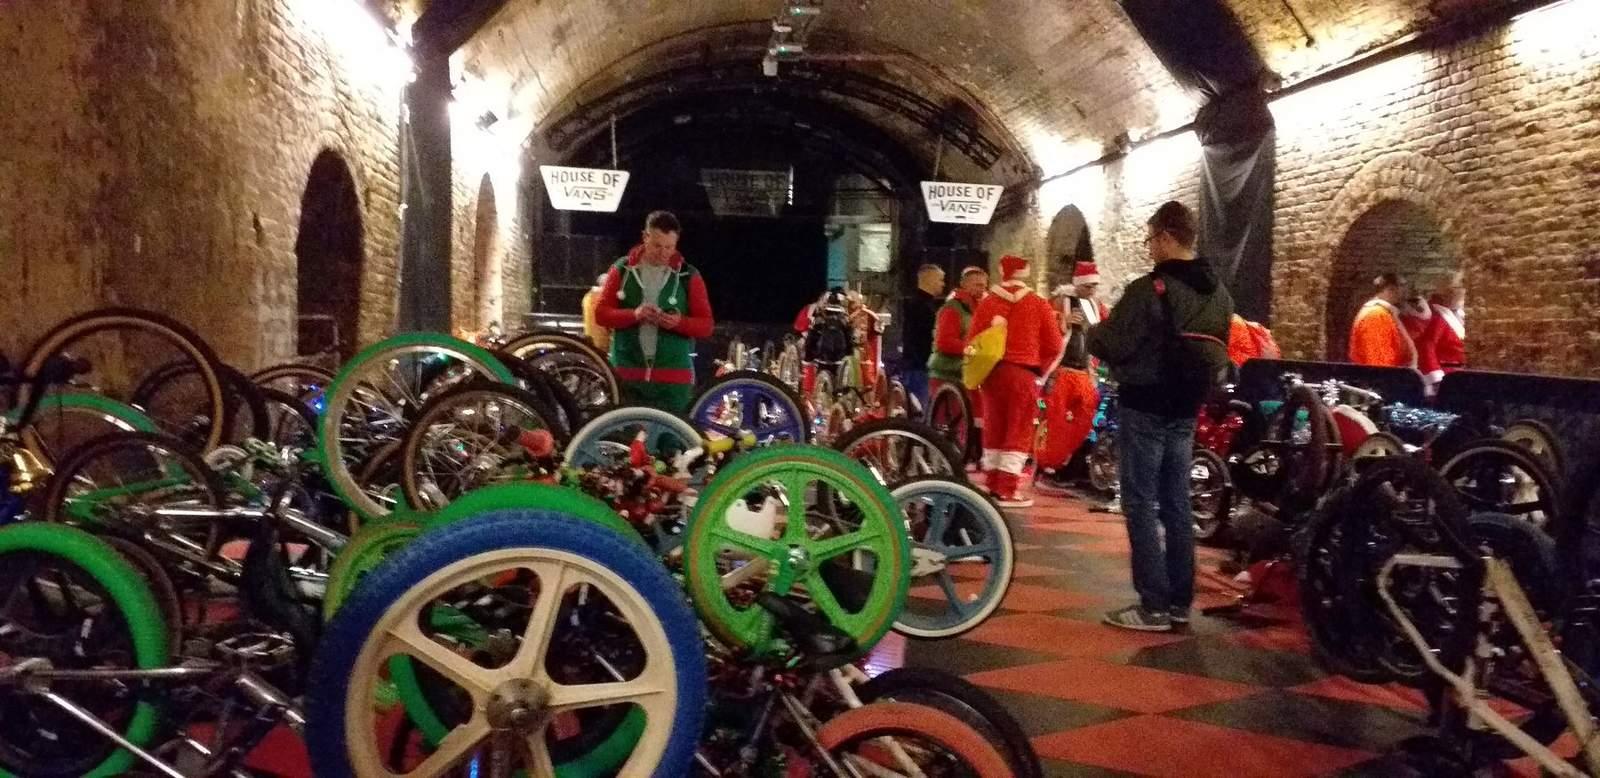 https://s3.amazonaws.com/uploads.bmxmuseum.com/user-images/84768/vans-bikes-stored5f7b33b28e.jpg